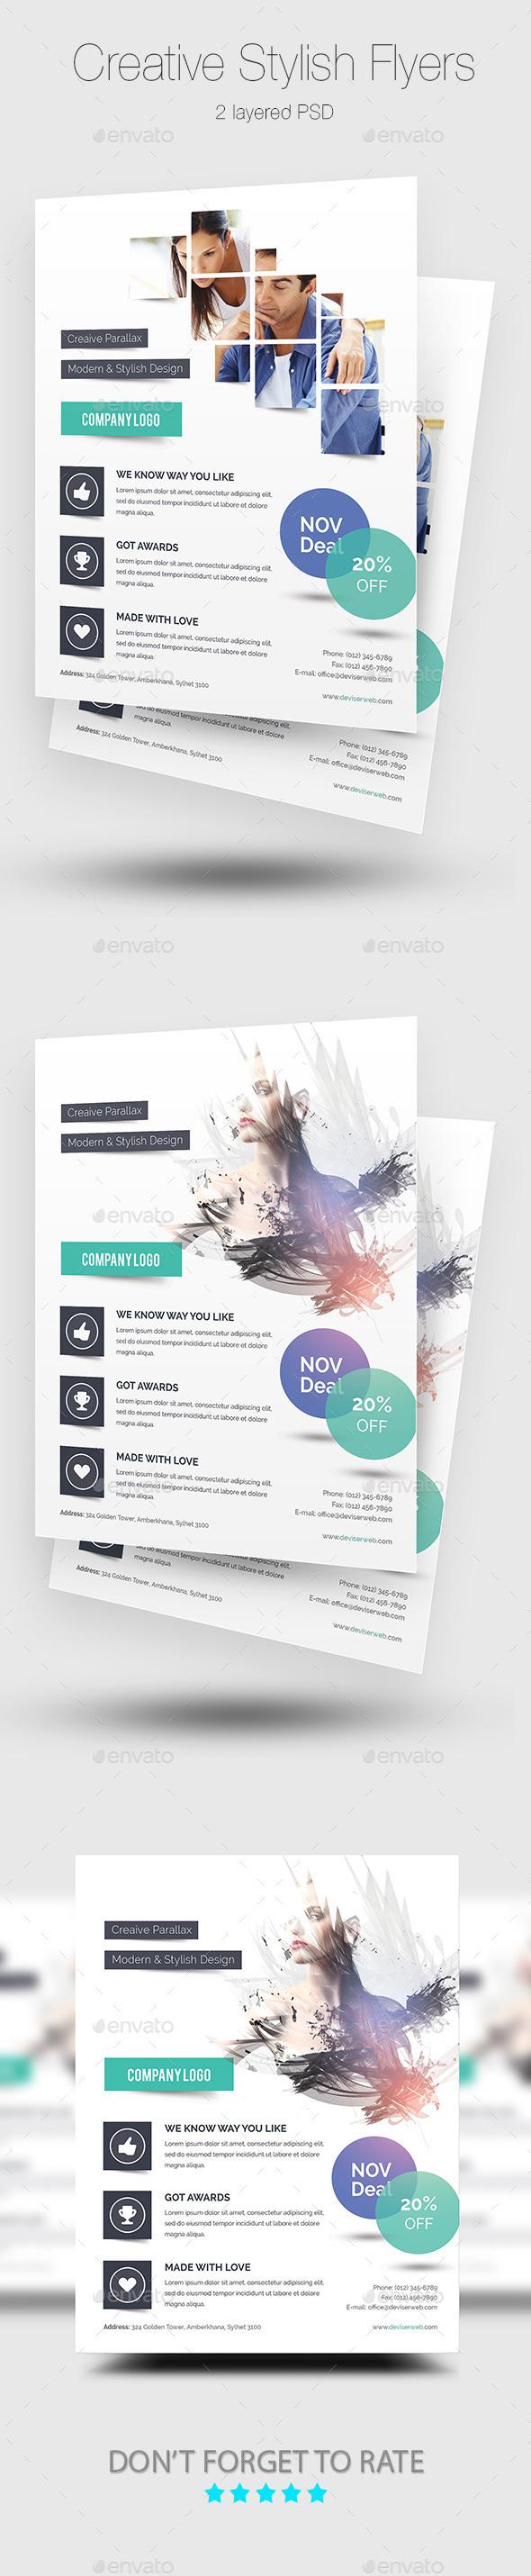 Creative Stylish Flyer Templates - Corporate Flyers